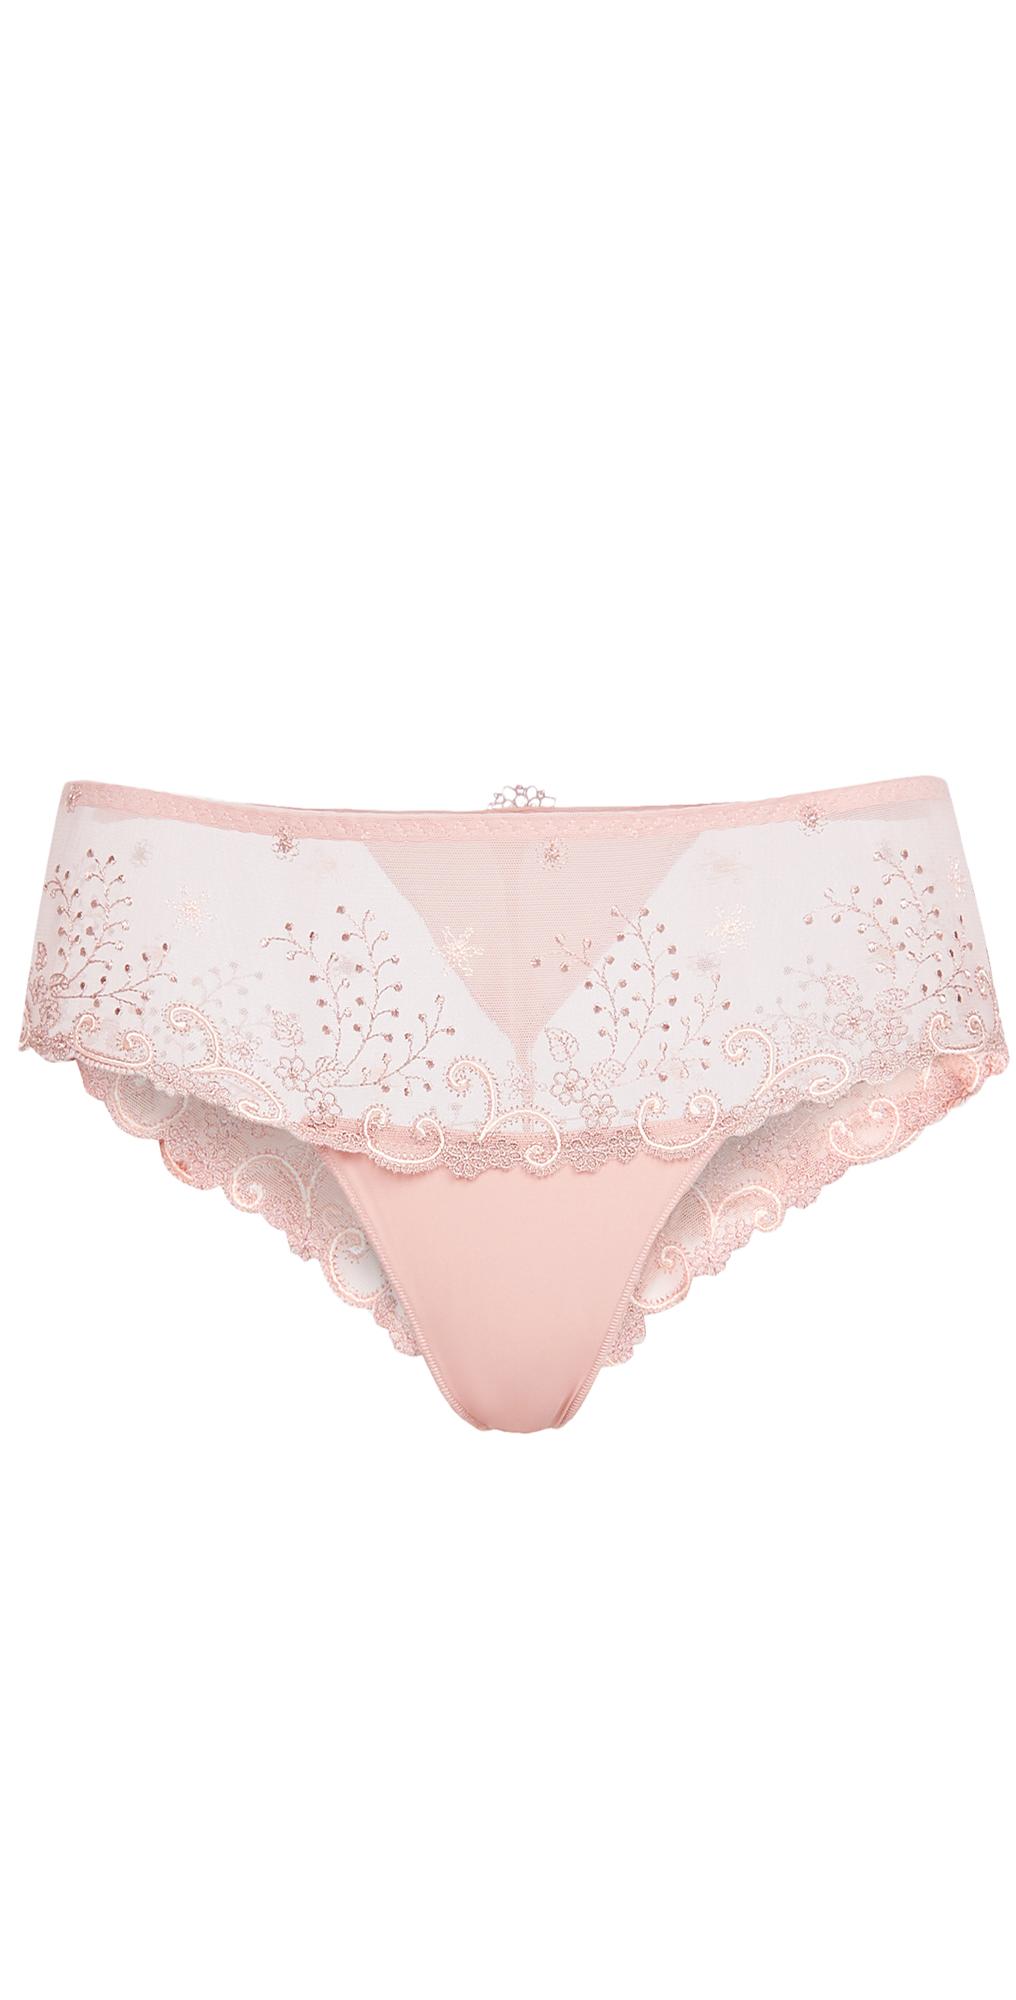 Simone Perele Delice Boy Shorts